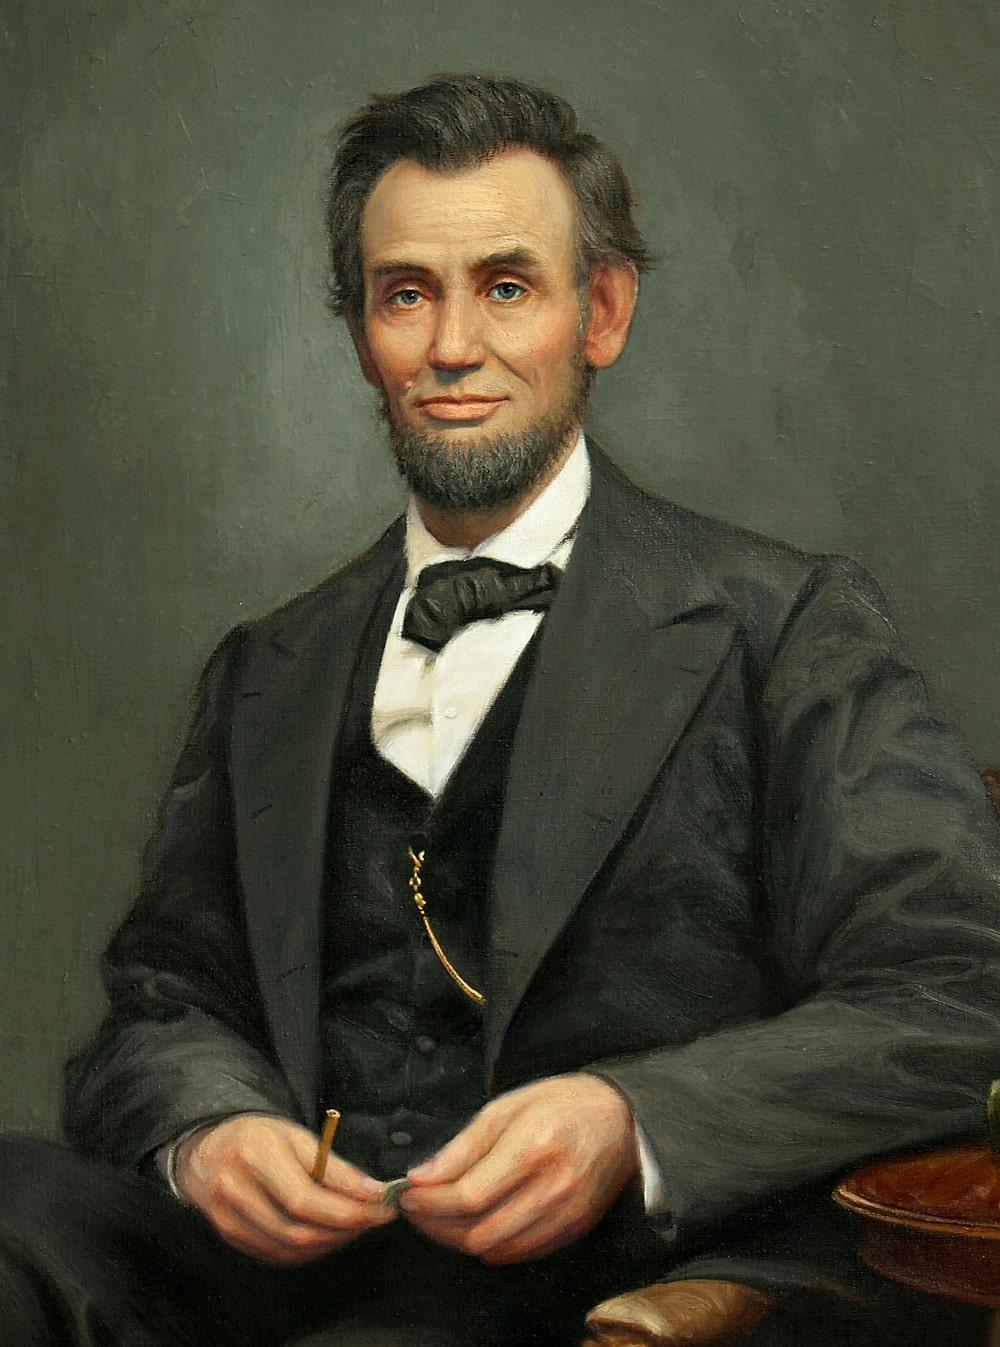 Avraam-Linkoln-interesnyefakty.org-1